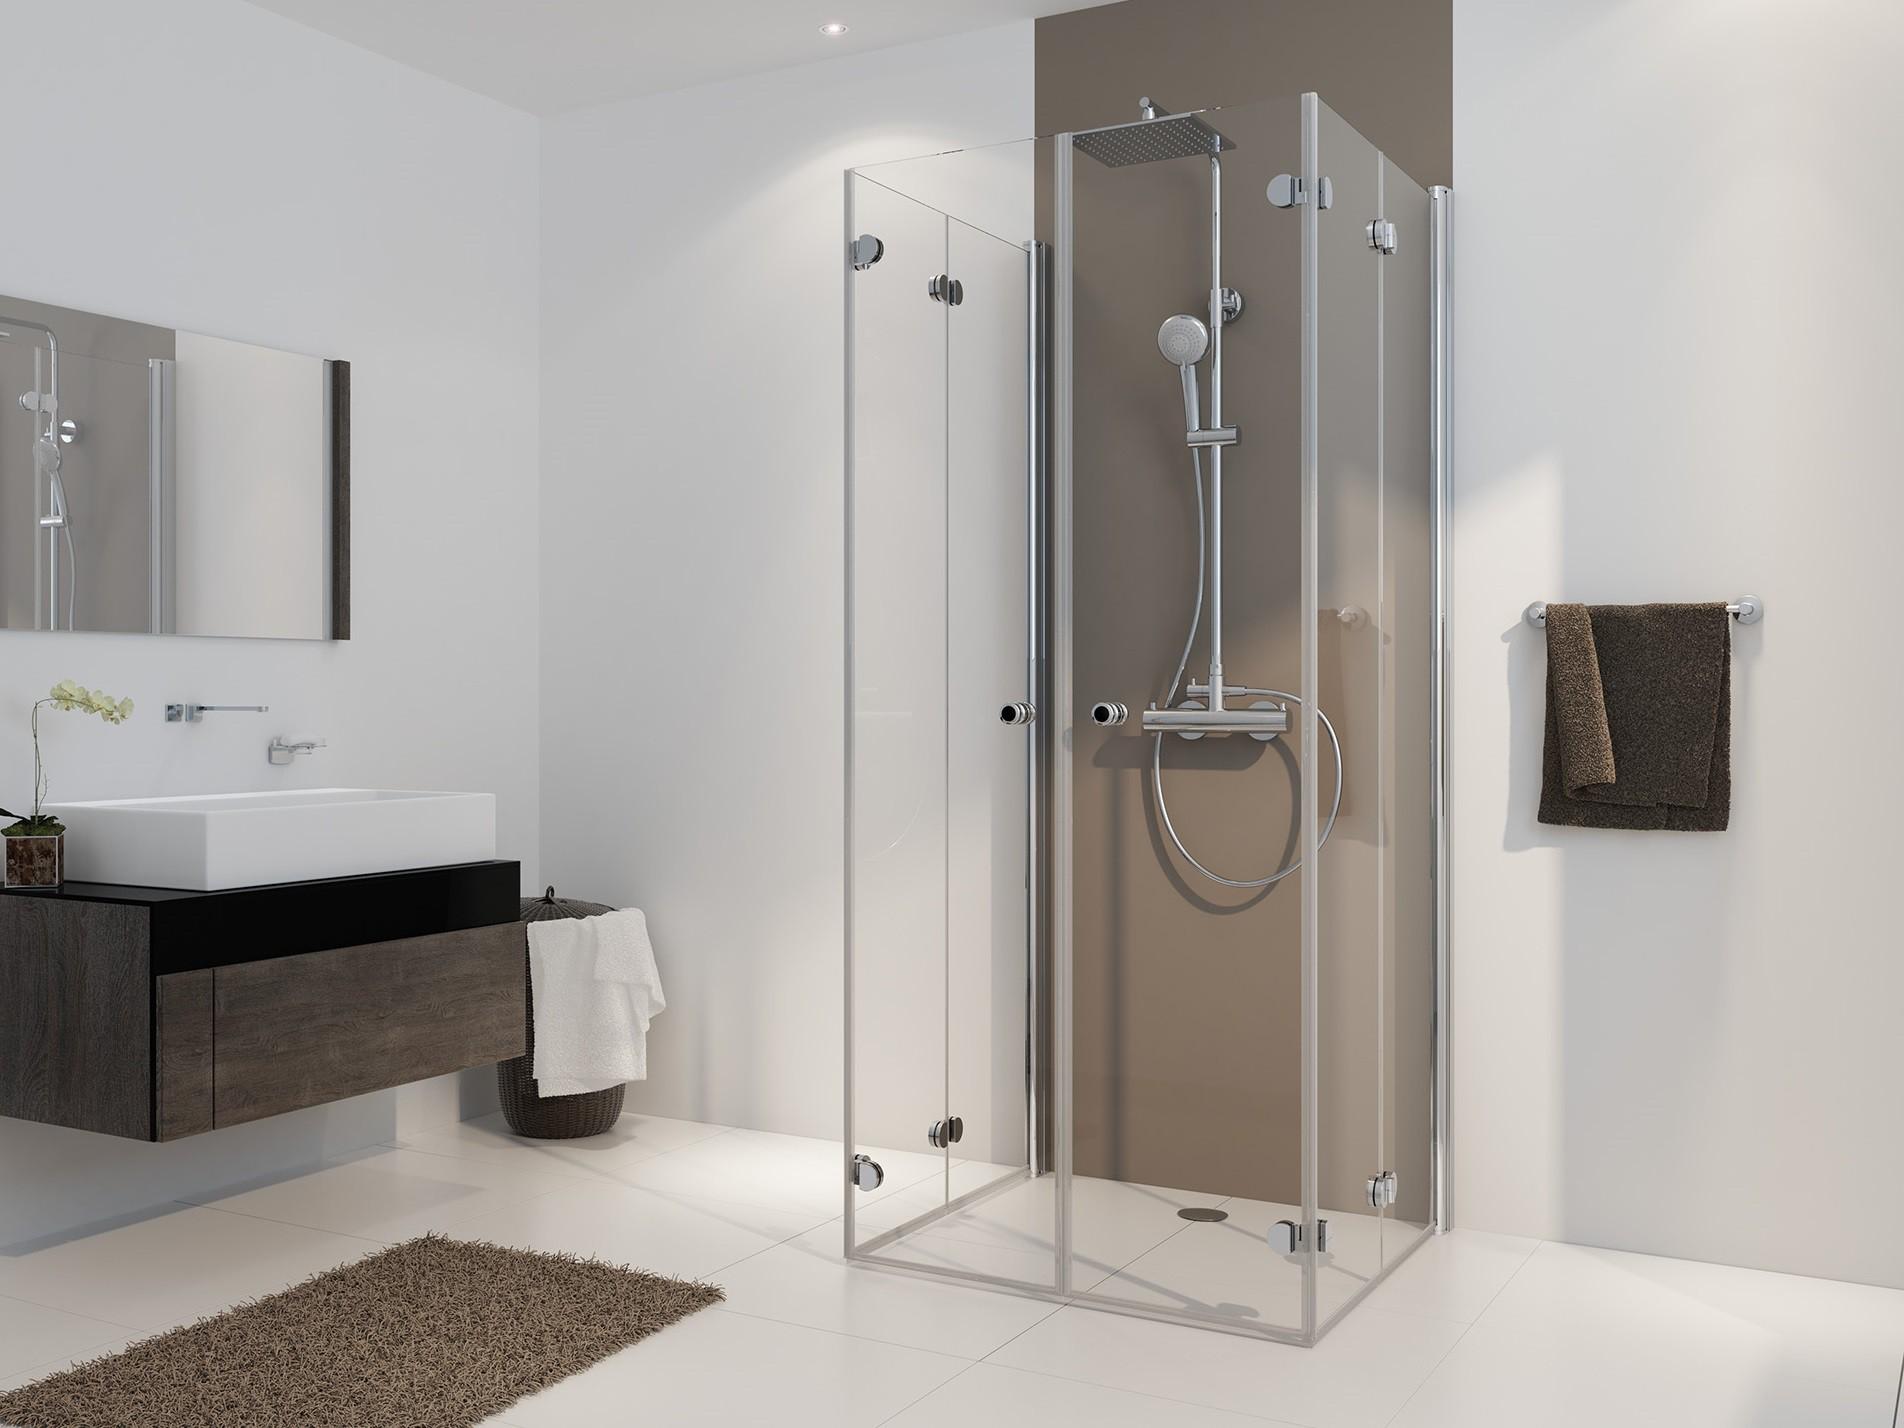 freistehende dusche home ideen. Black Bedroom Furniture Sets. Home Design Ideas